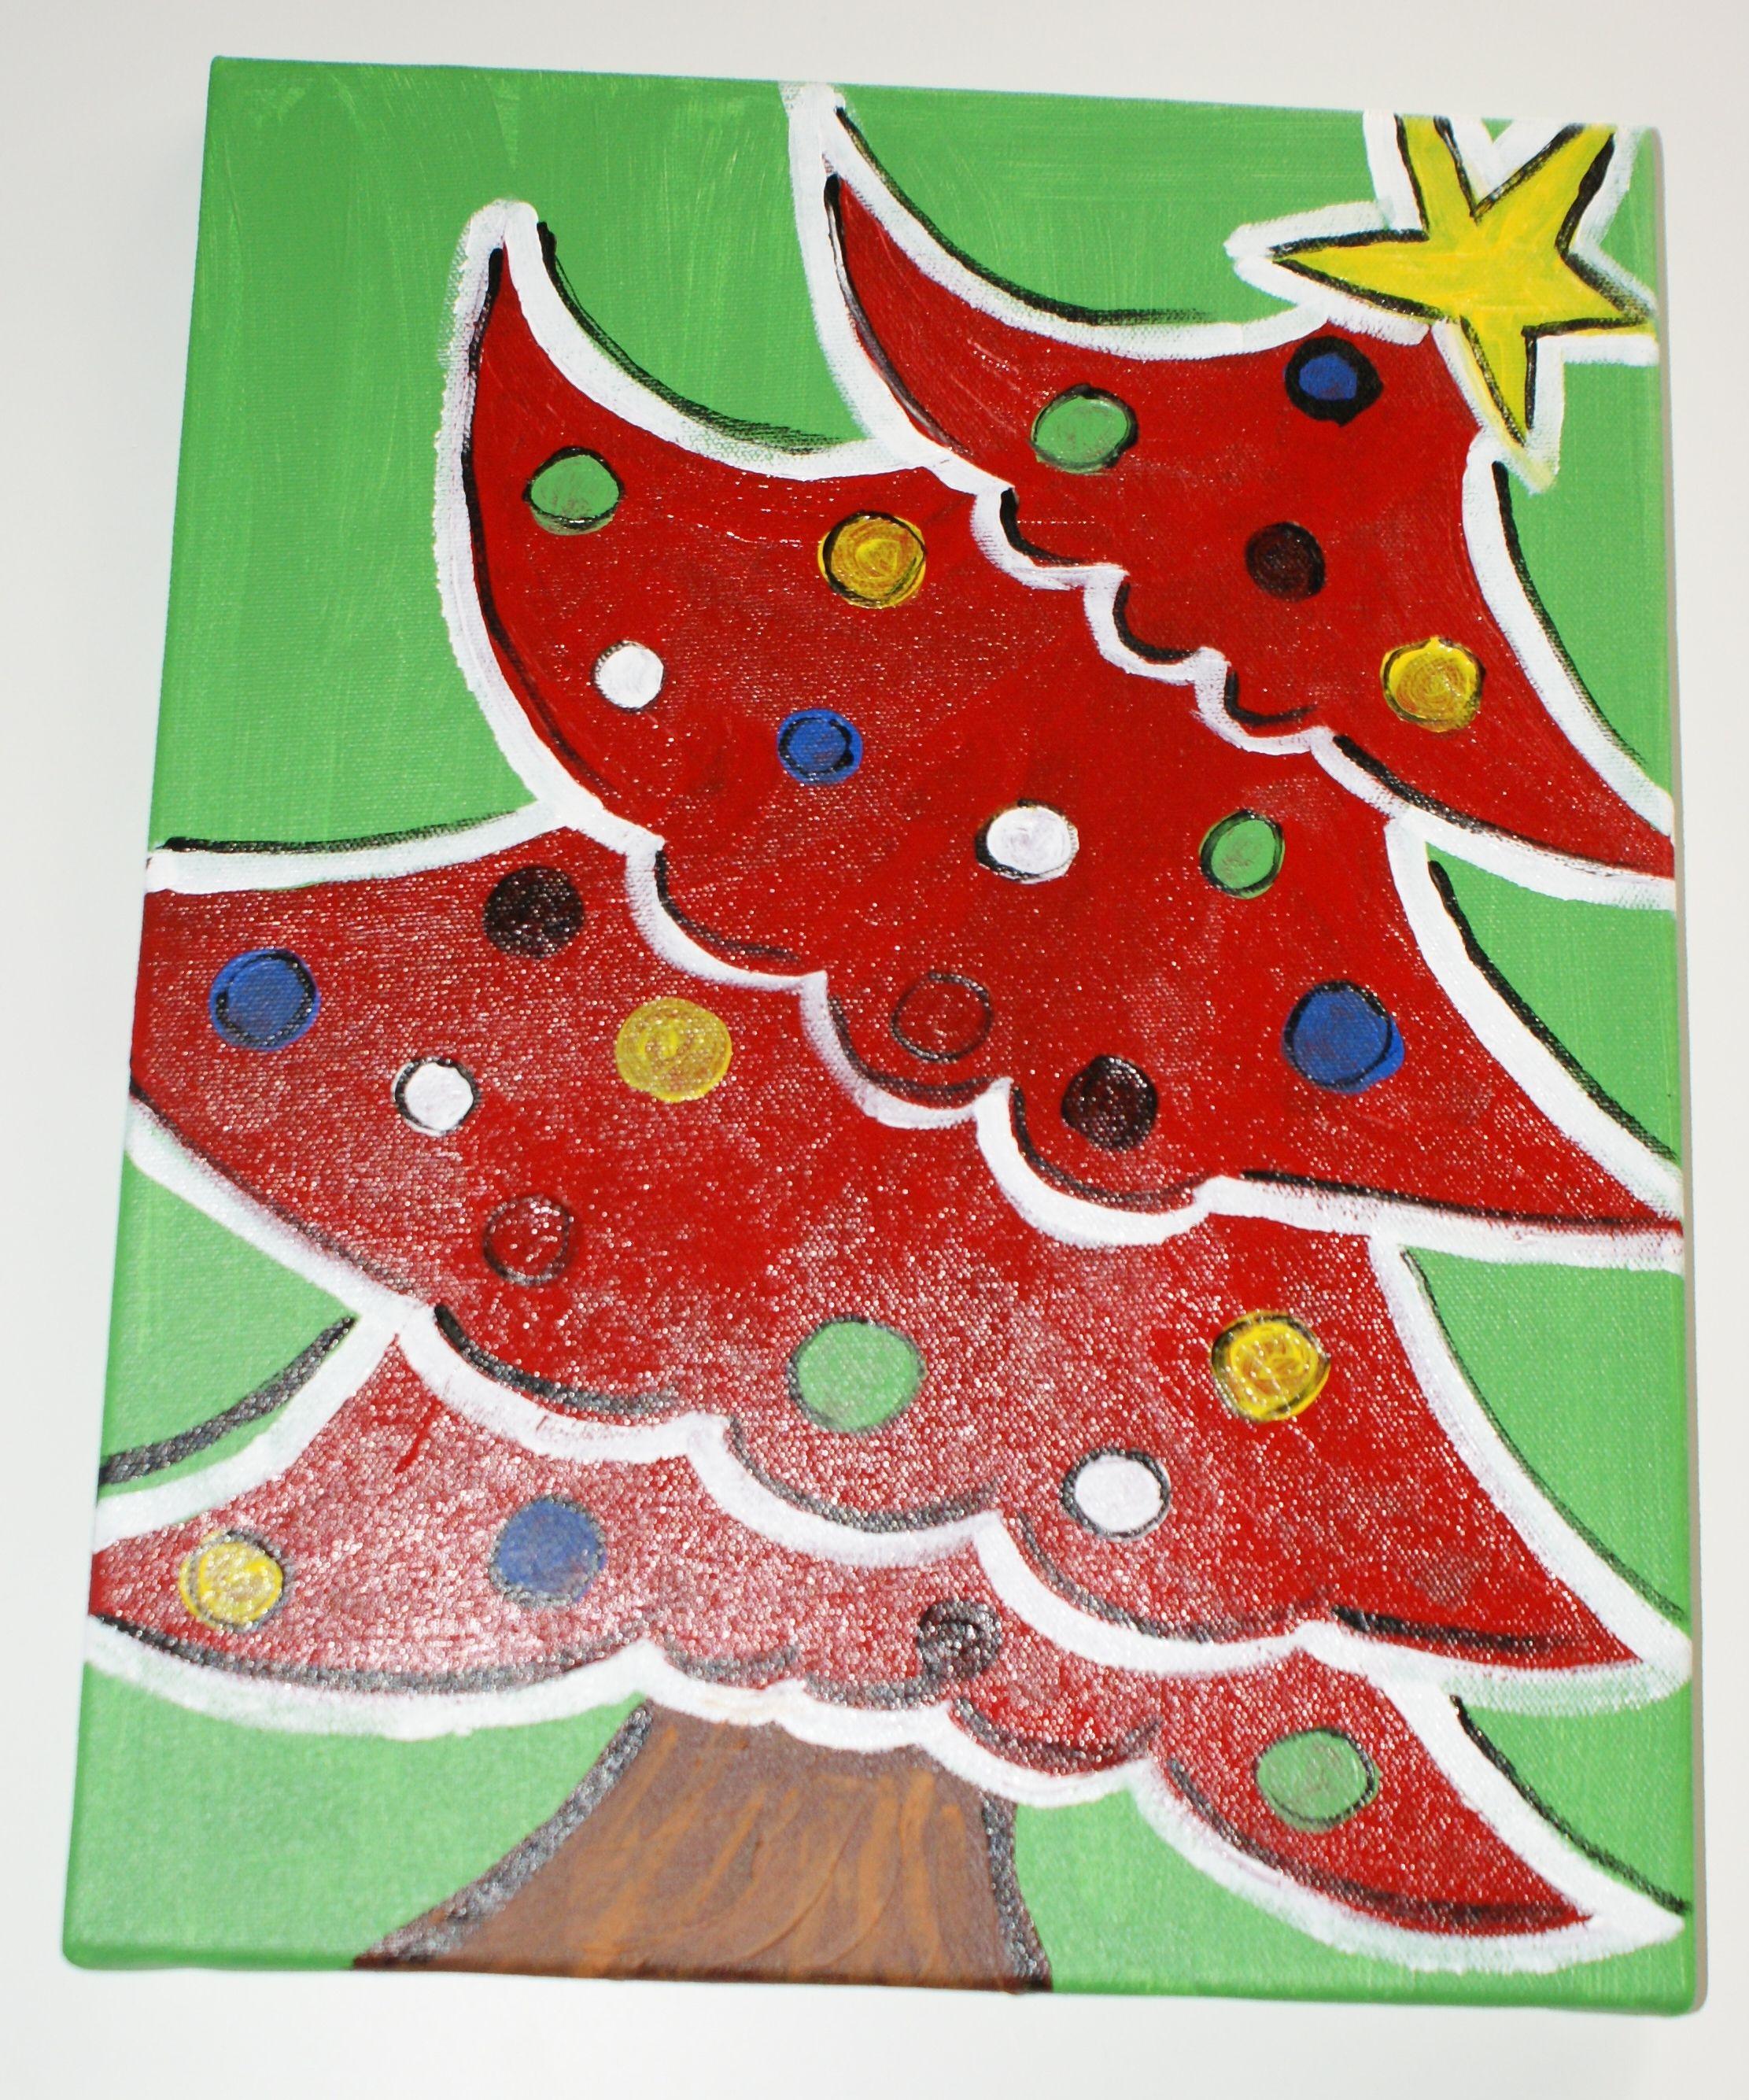 Whimsical Christmas Trees Ideas: Whimsical Christmas Trees